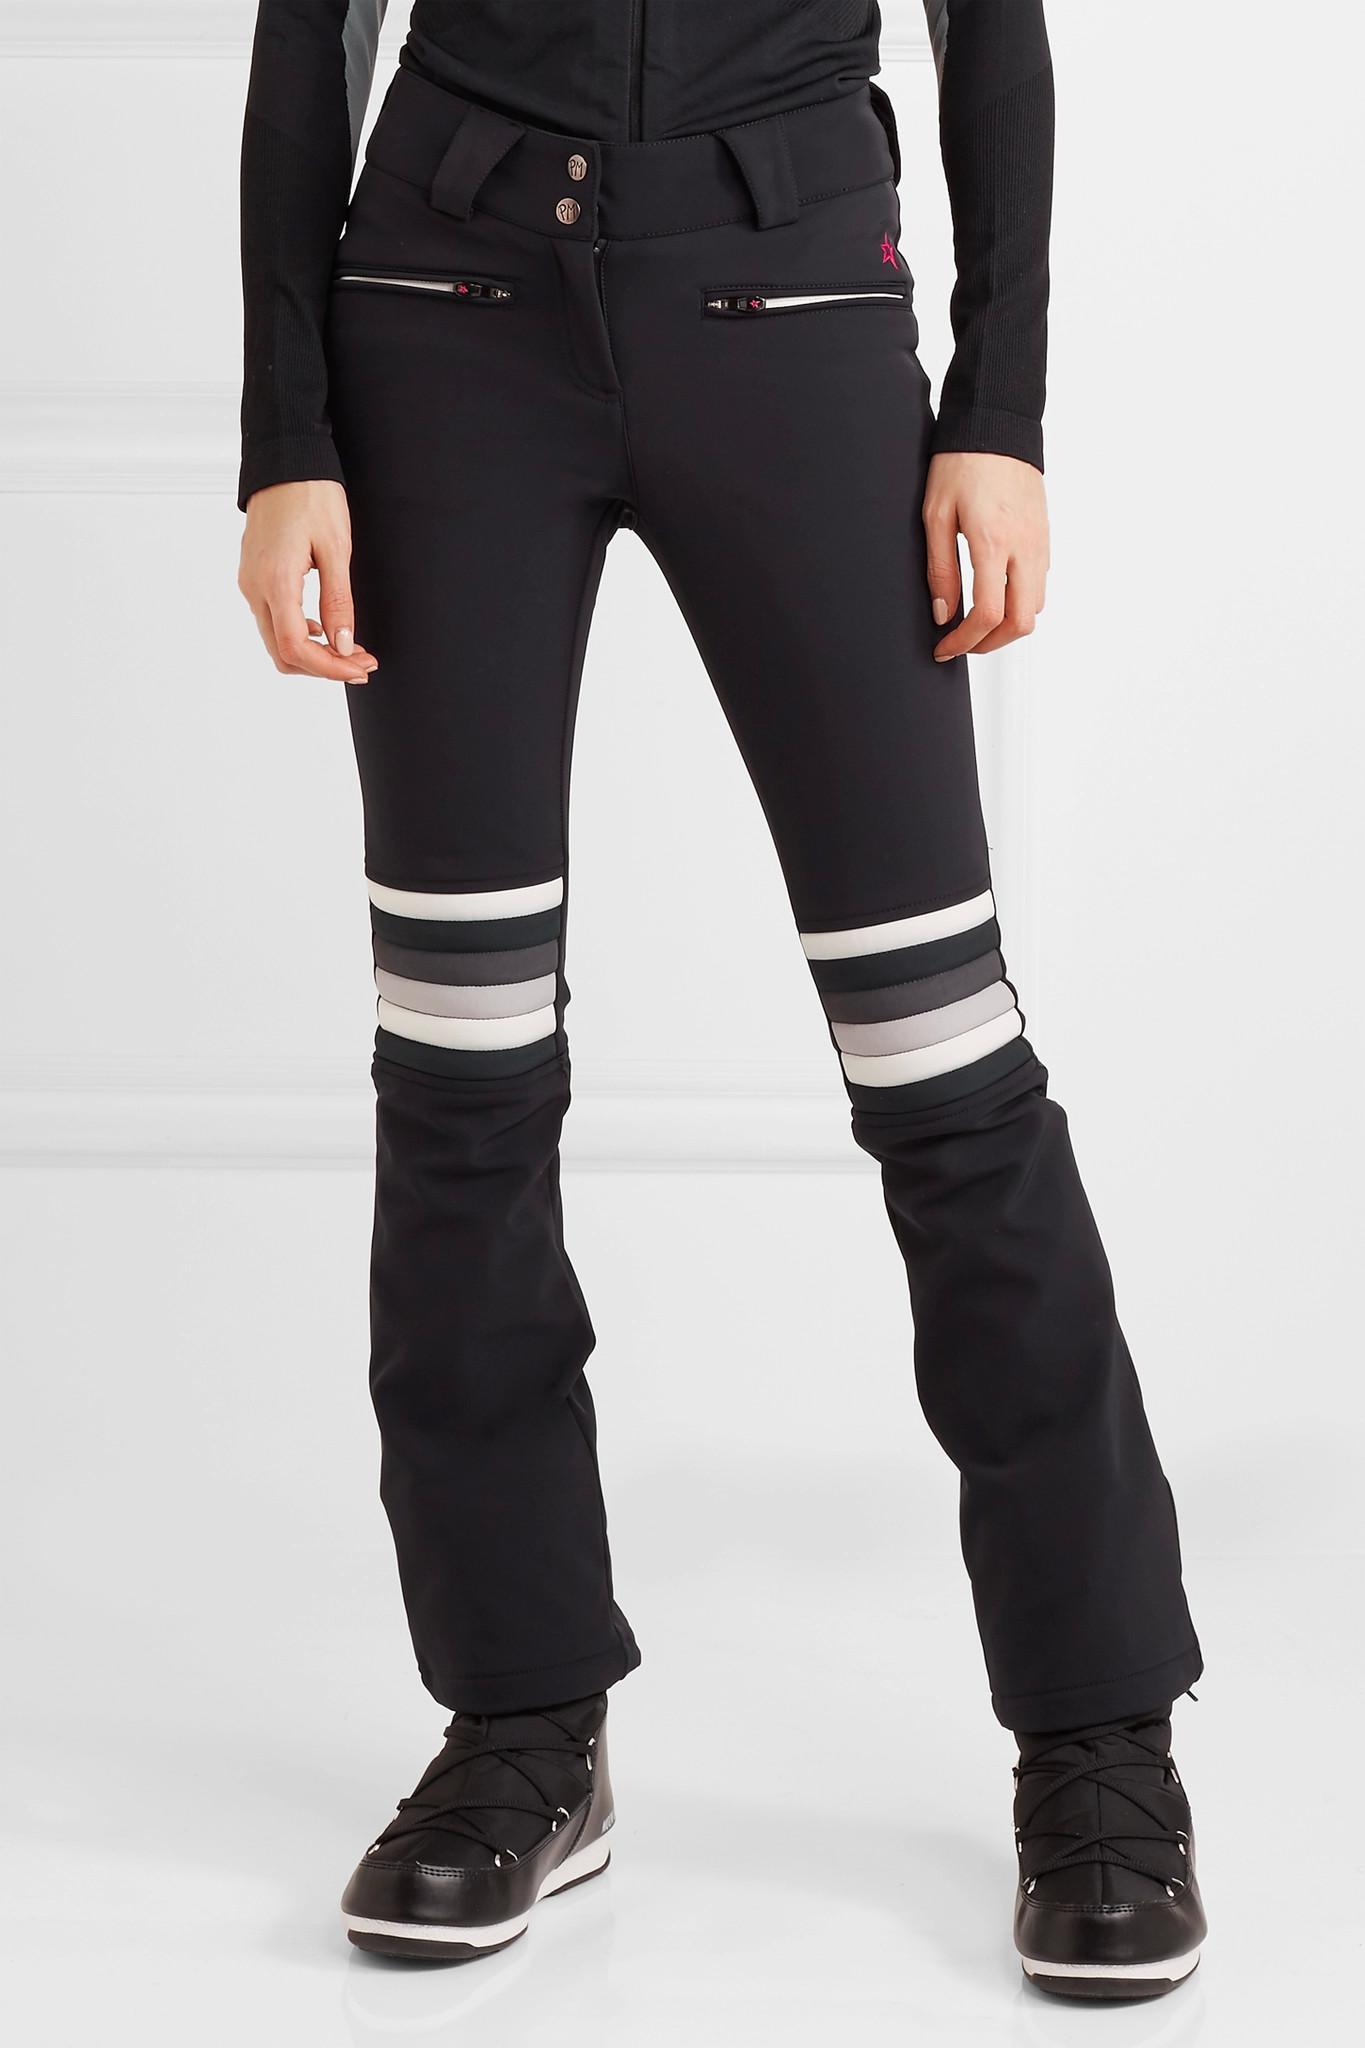 14352521abe7e Lyst - Perfect Moment Aurora Flared Ski Pants in Black